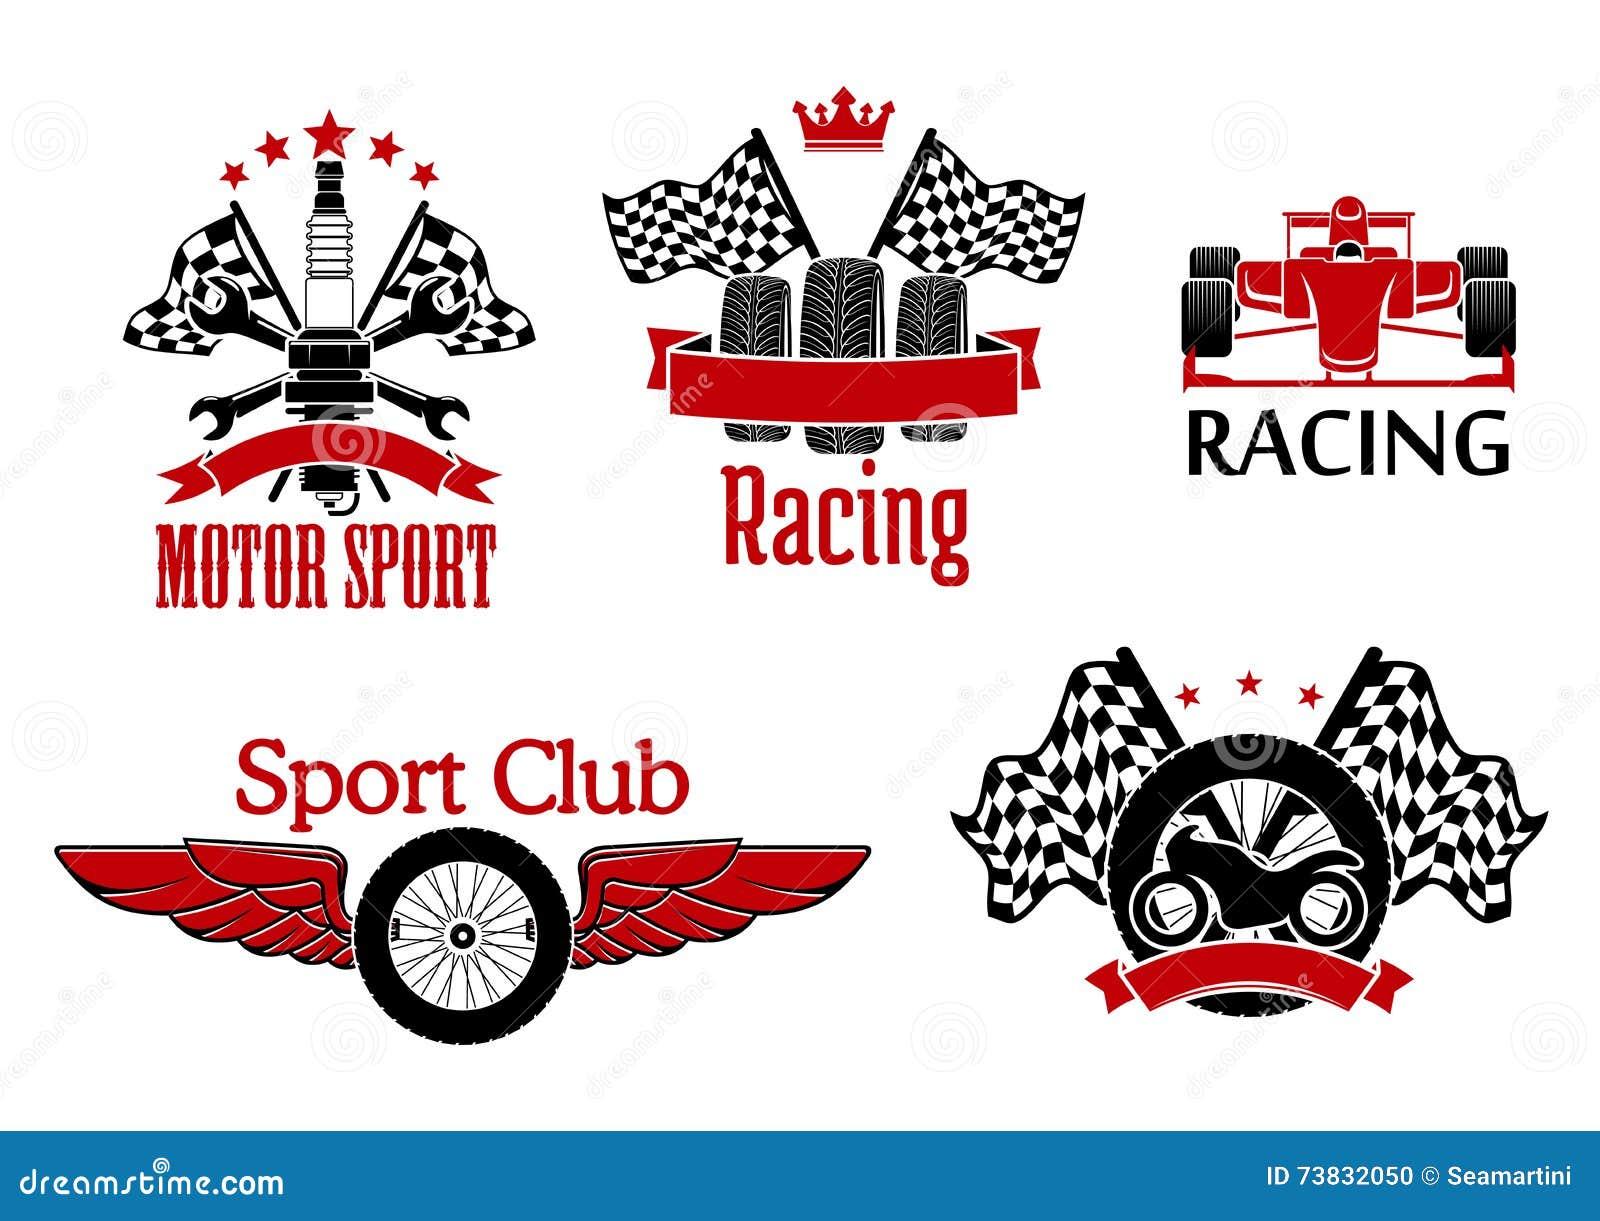 motorsport symbols for auto racing design stock vector